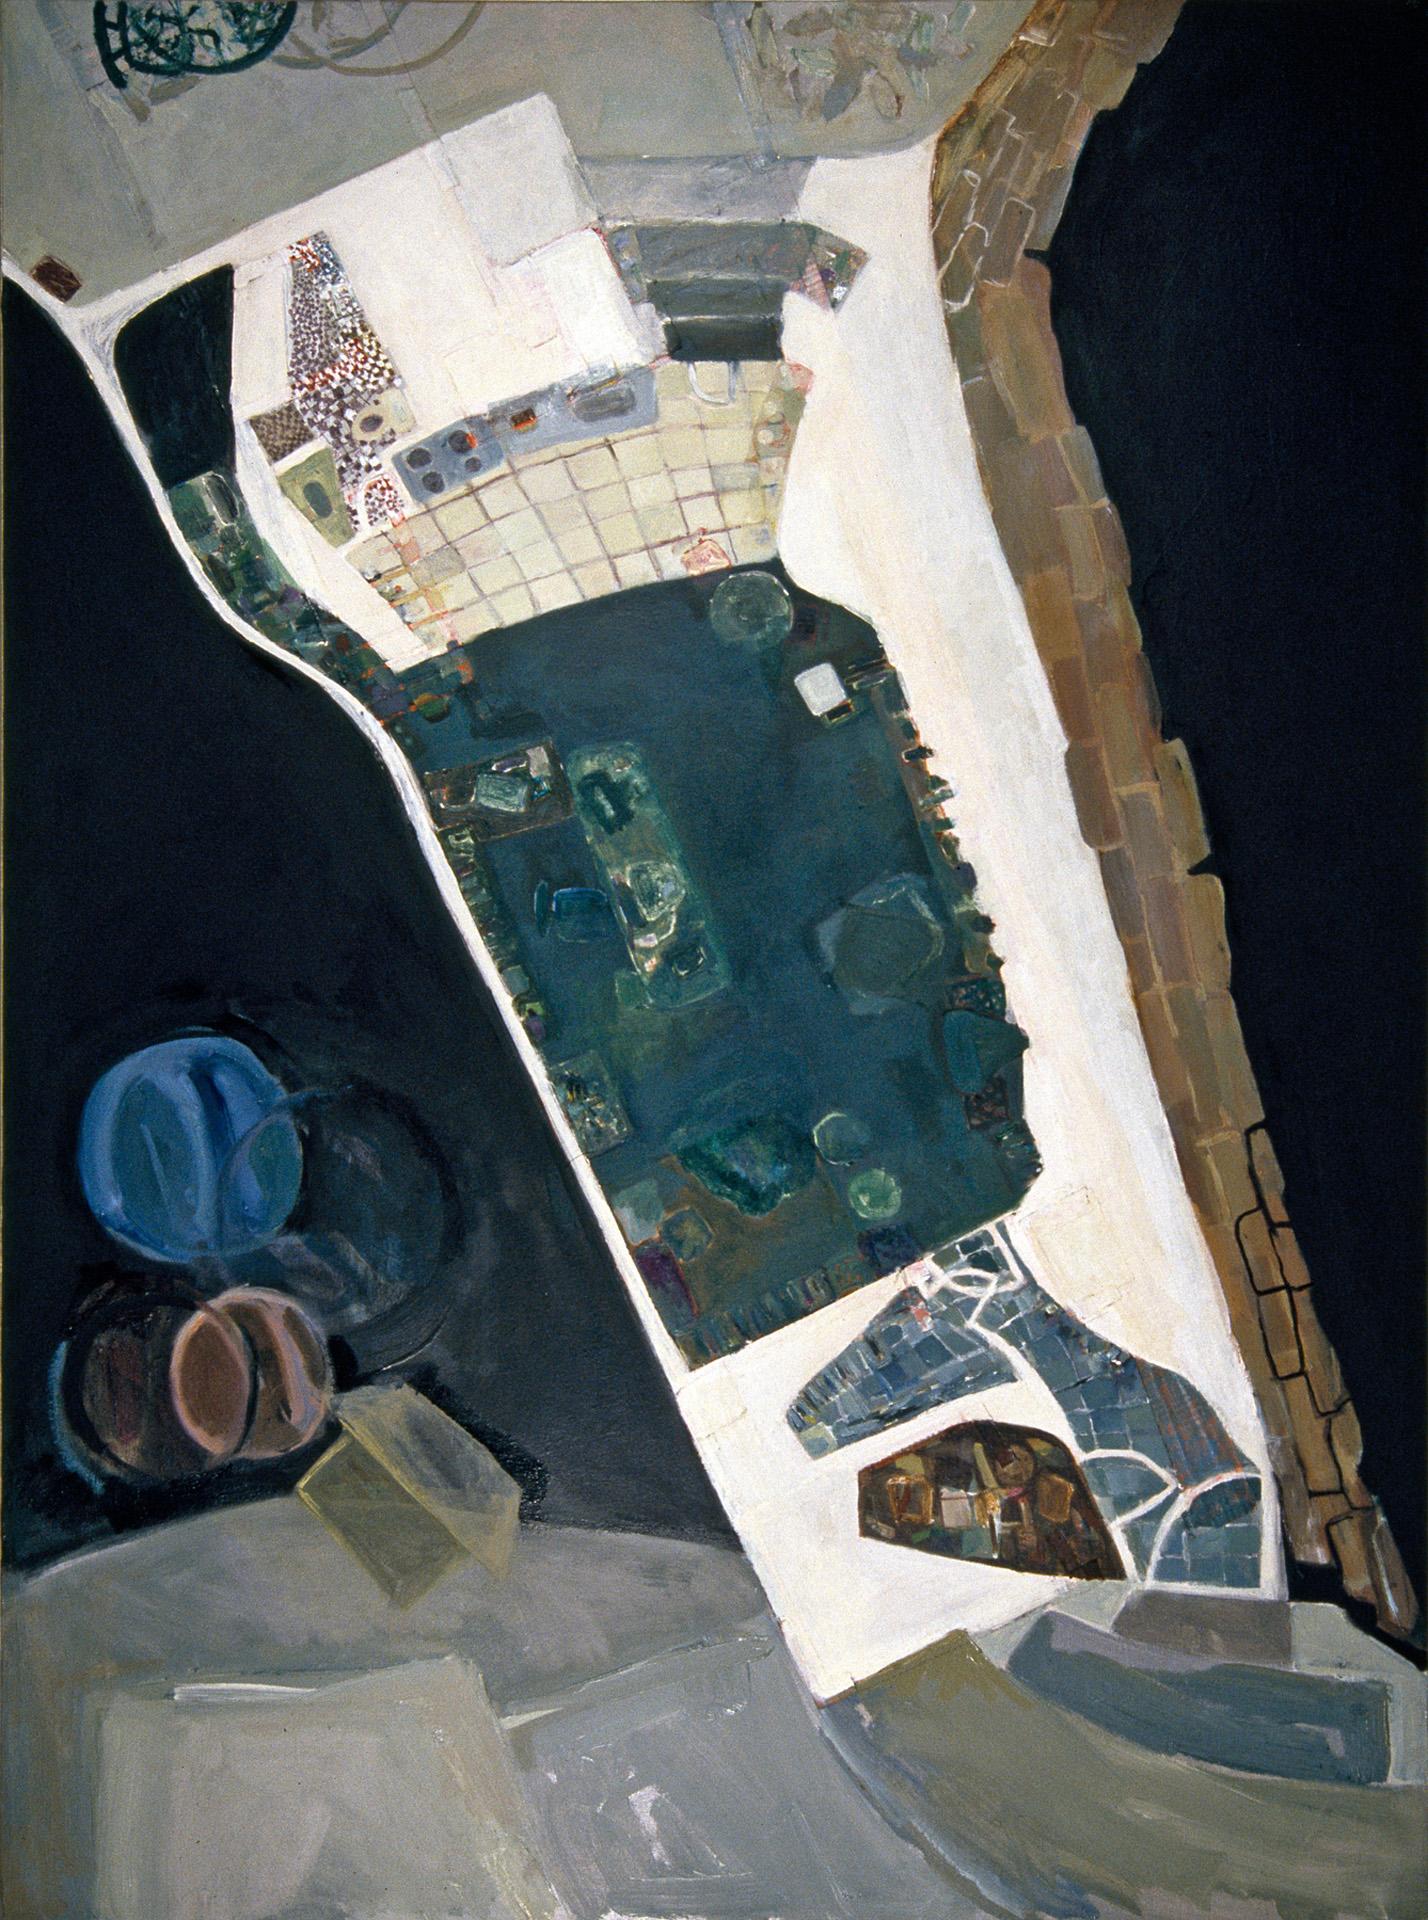 23b Horace Court, Basement, Brooklyn, NY, 8/2002 to 8/2003